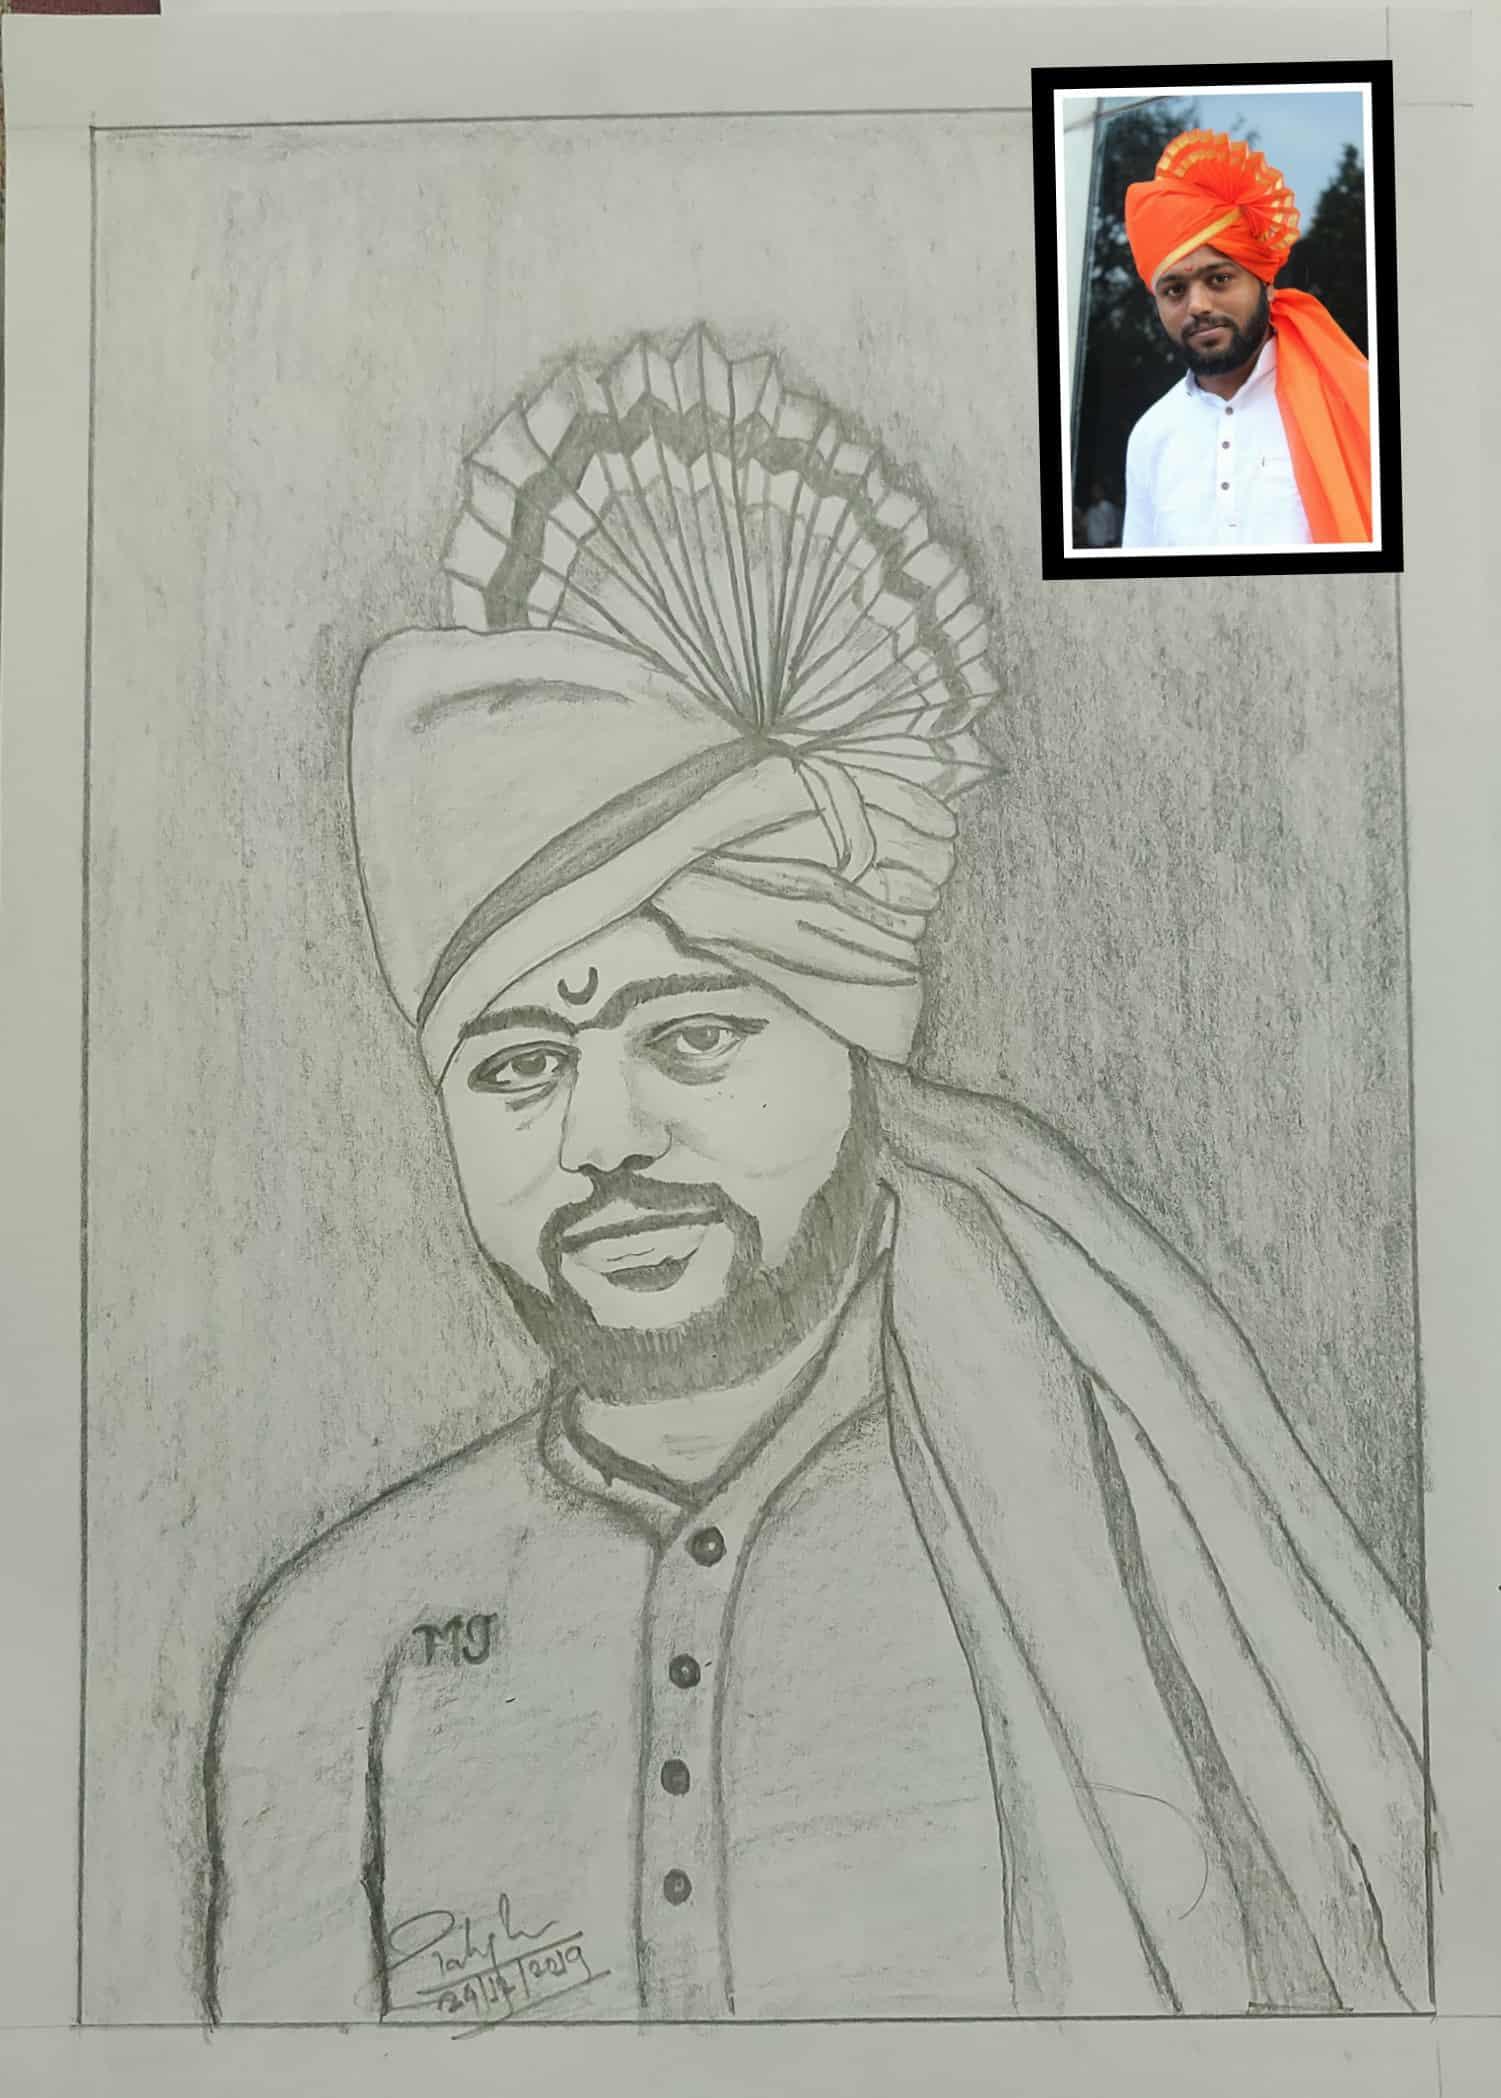 IASbaba - Catharsis-Sketch by Mahesh-2